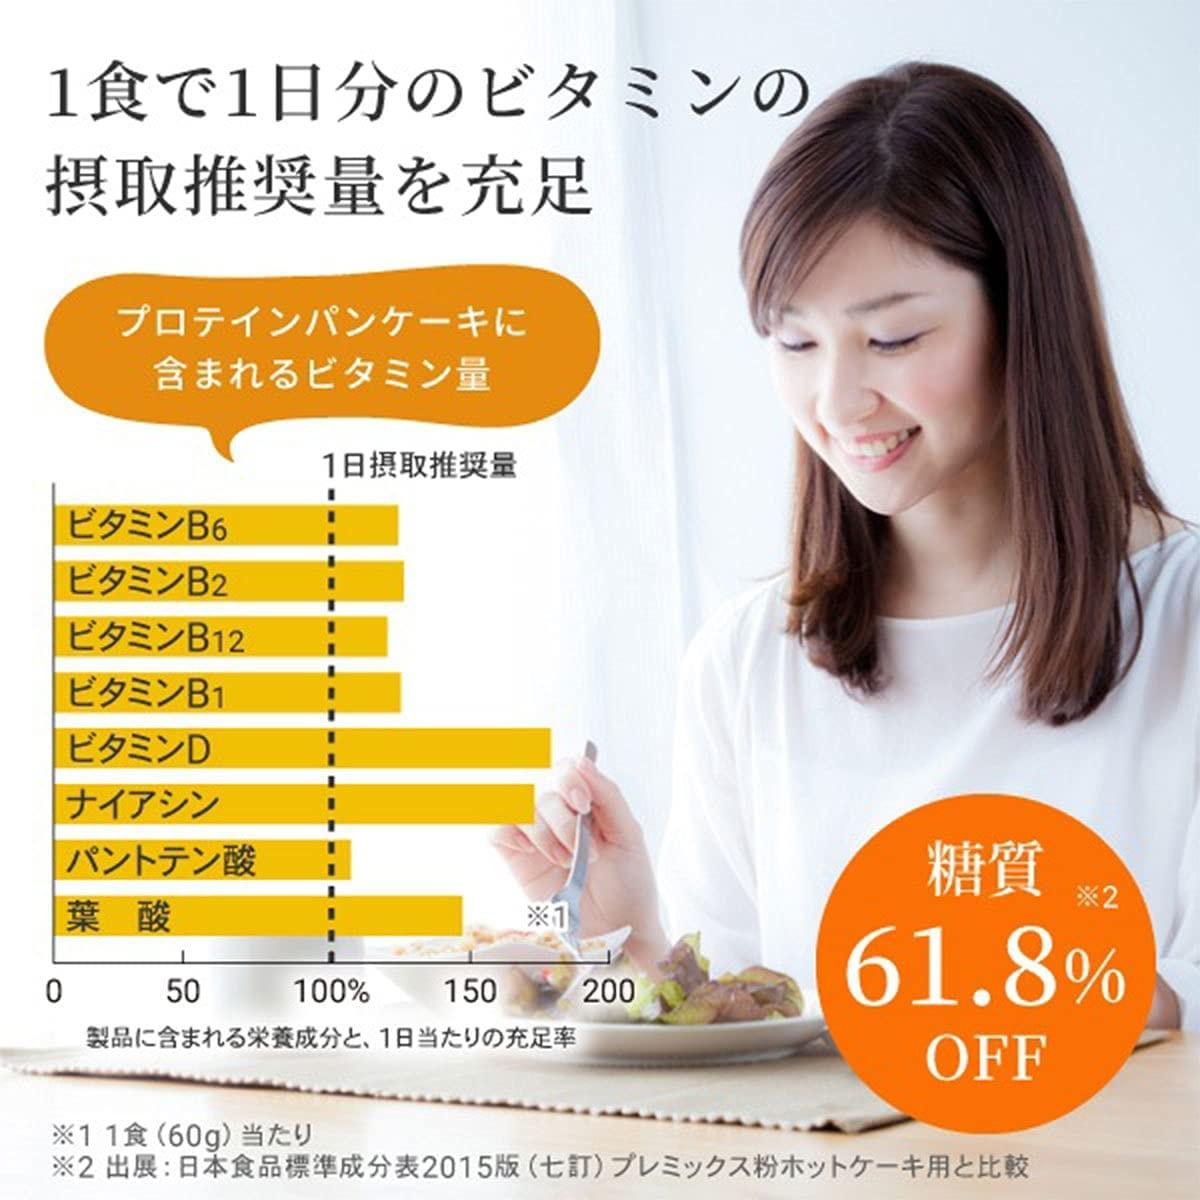 AFC(エーエフシー) プロテインパンケーキミックスの商品画像5